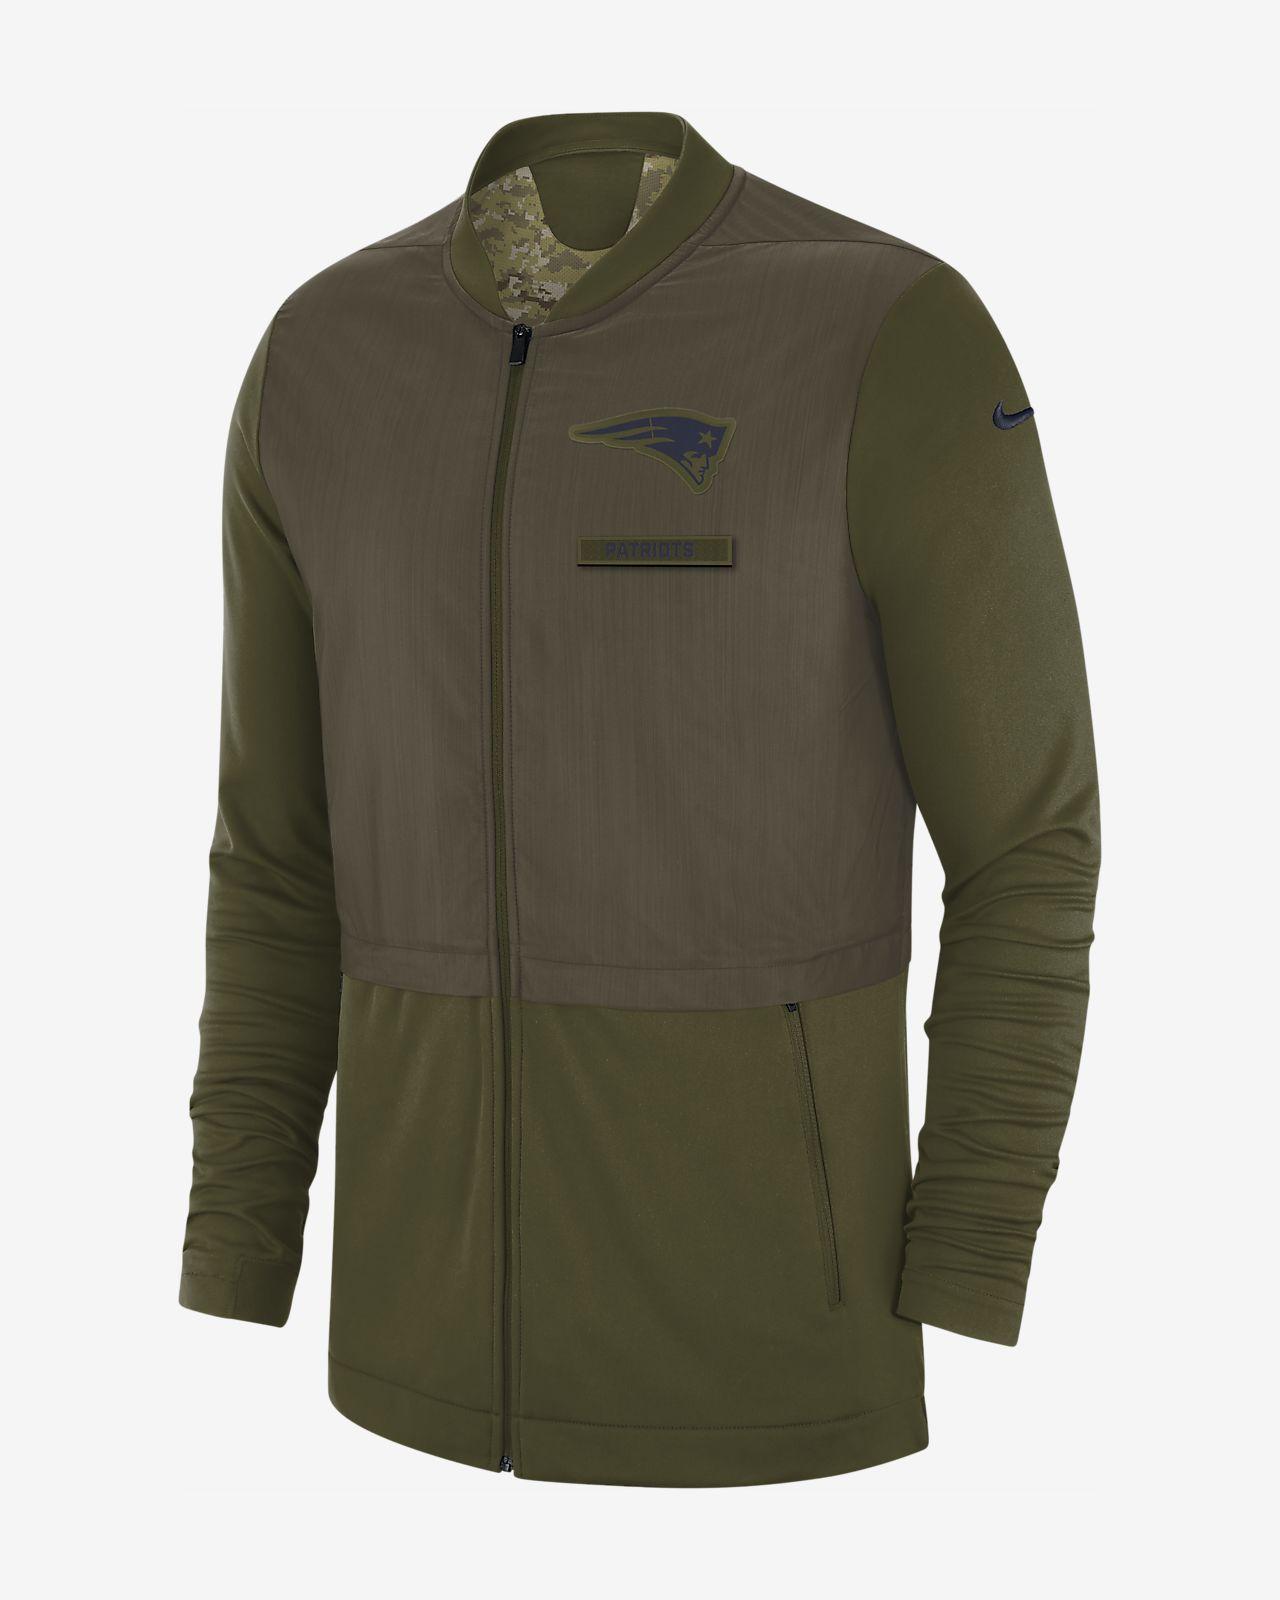 f15b18cf7 Nike Elite Hybrid Salute to Service (NFL Patriots) Men s Full-Zip ...